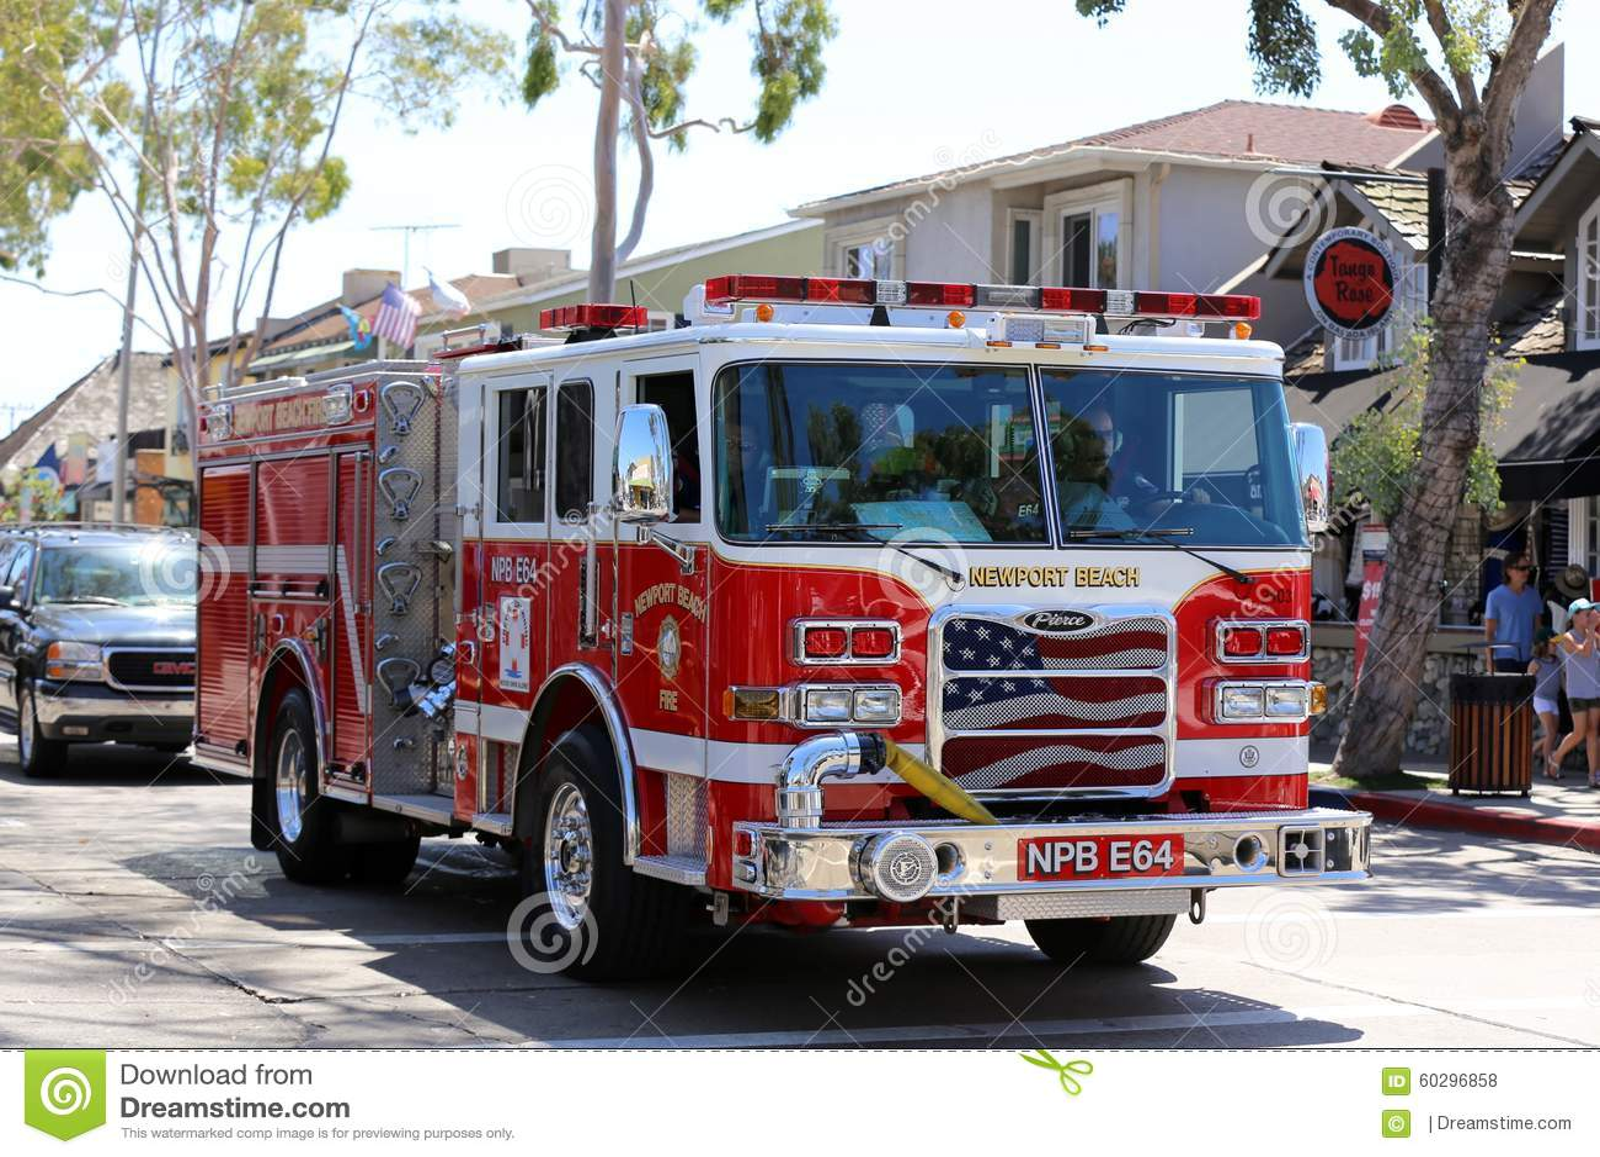 Fire department in Newport Beach